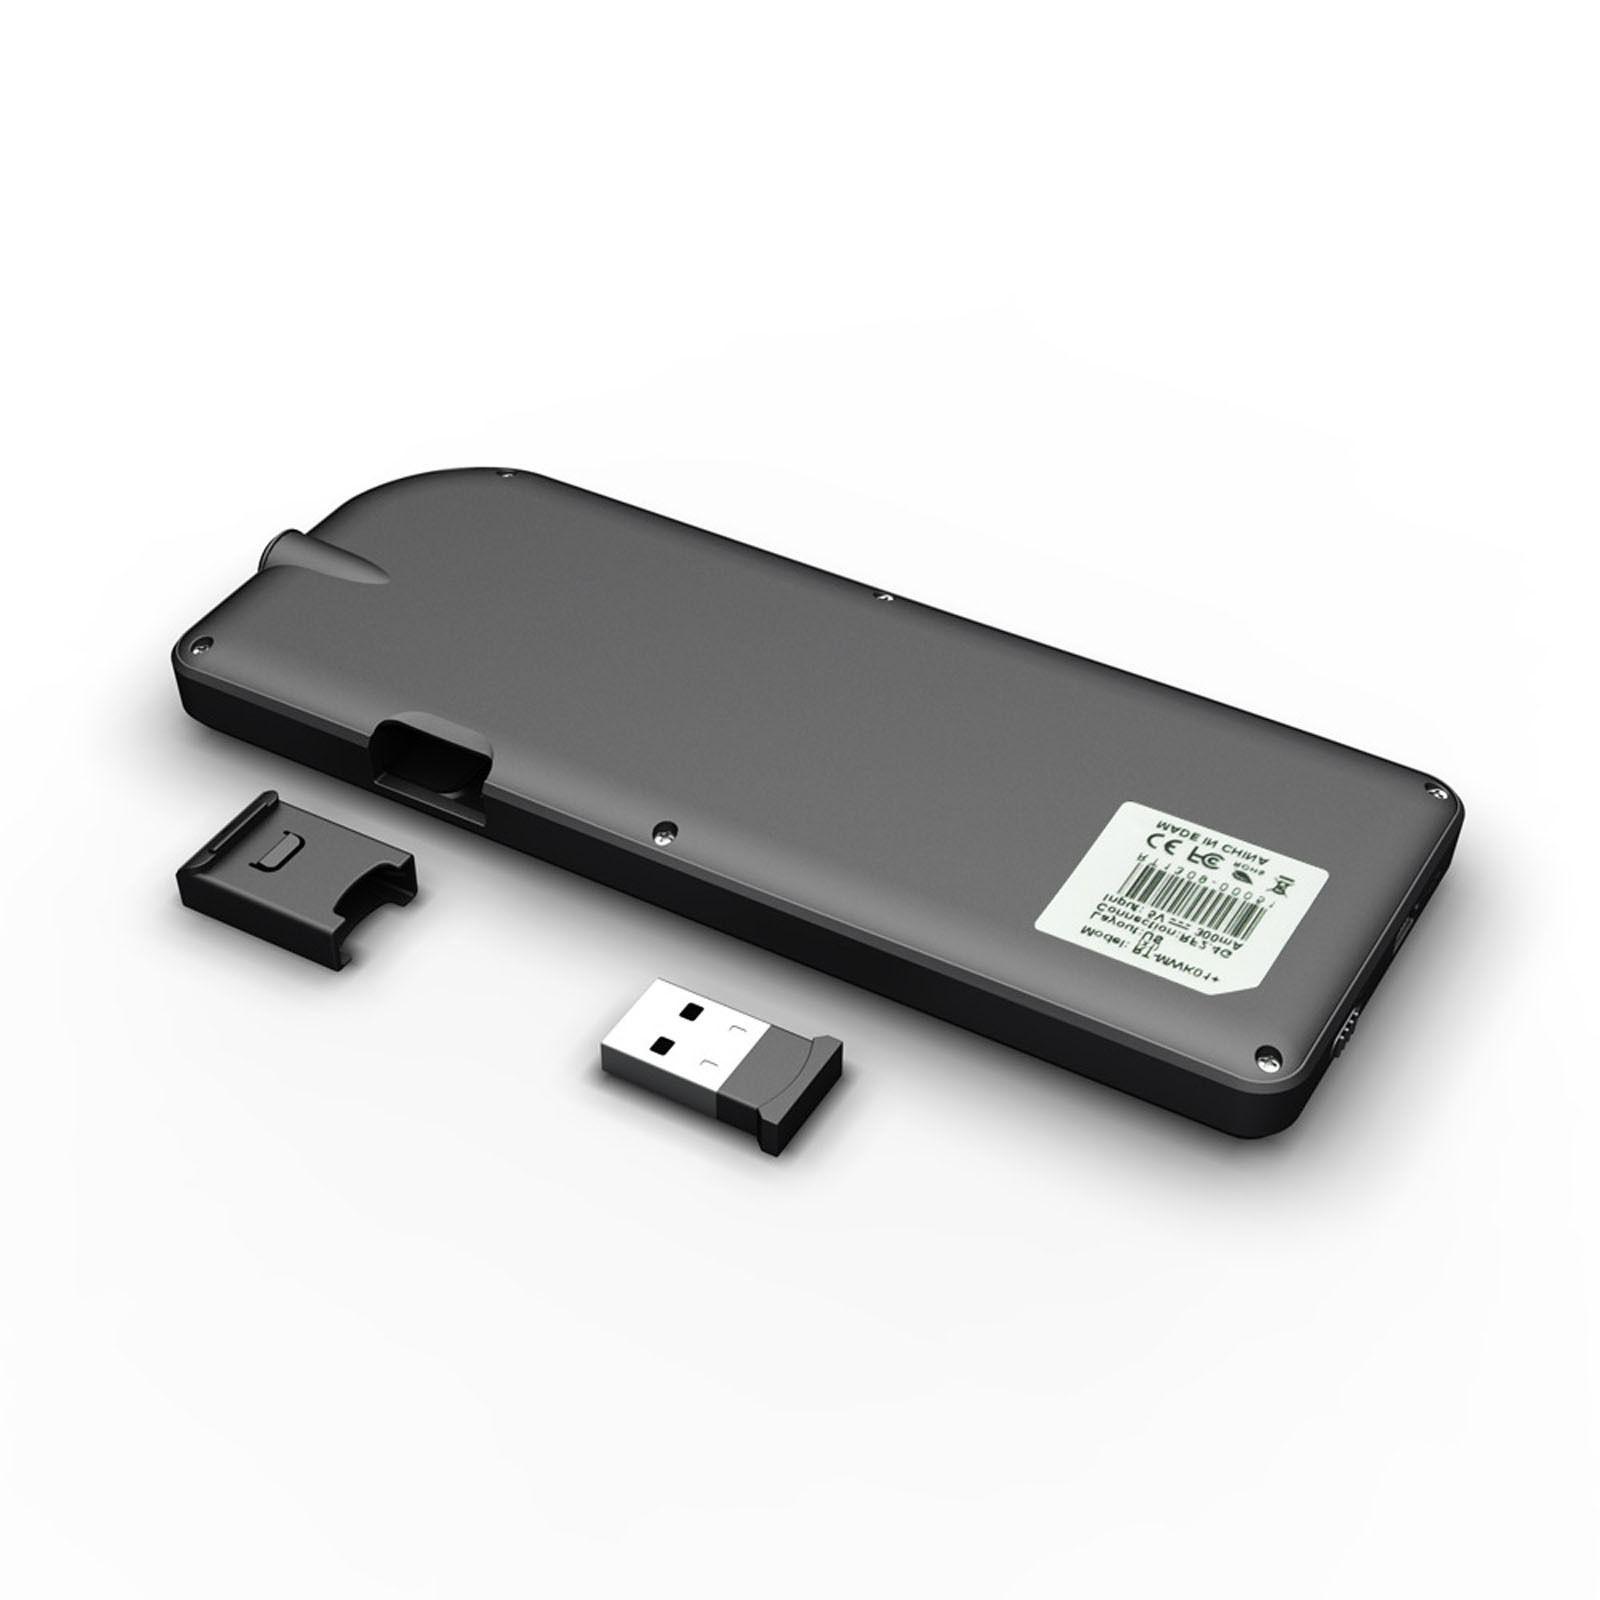 Rii Mini X1 Mini for TV Android Box